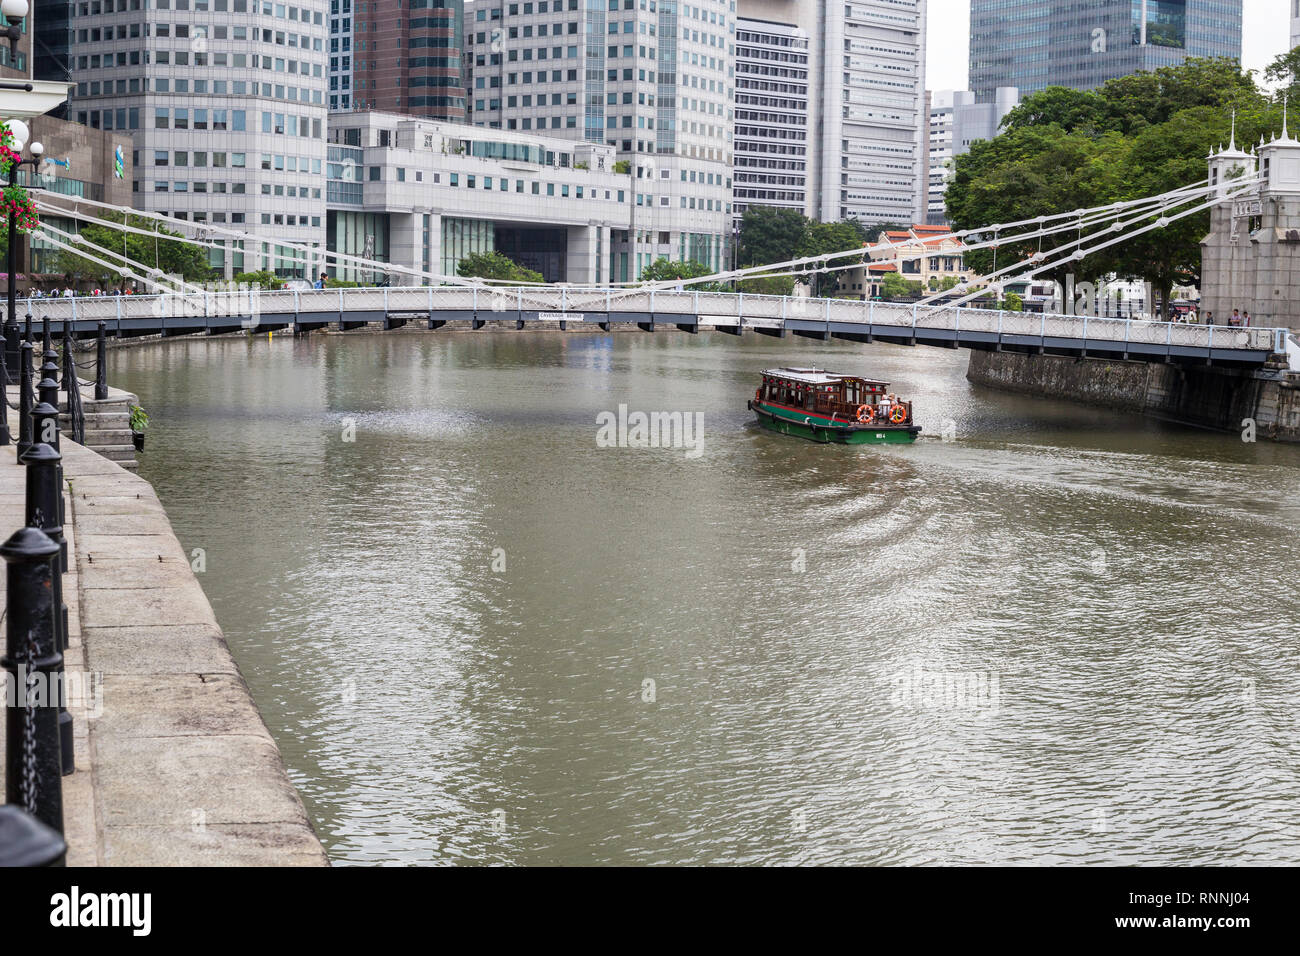 Water Taxi Passing under Cavenagh Bridge over Singapore River, 1870, Singapore. - Stock Image